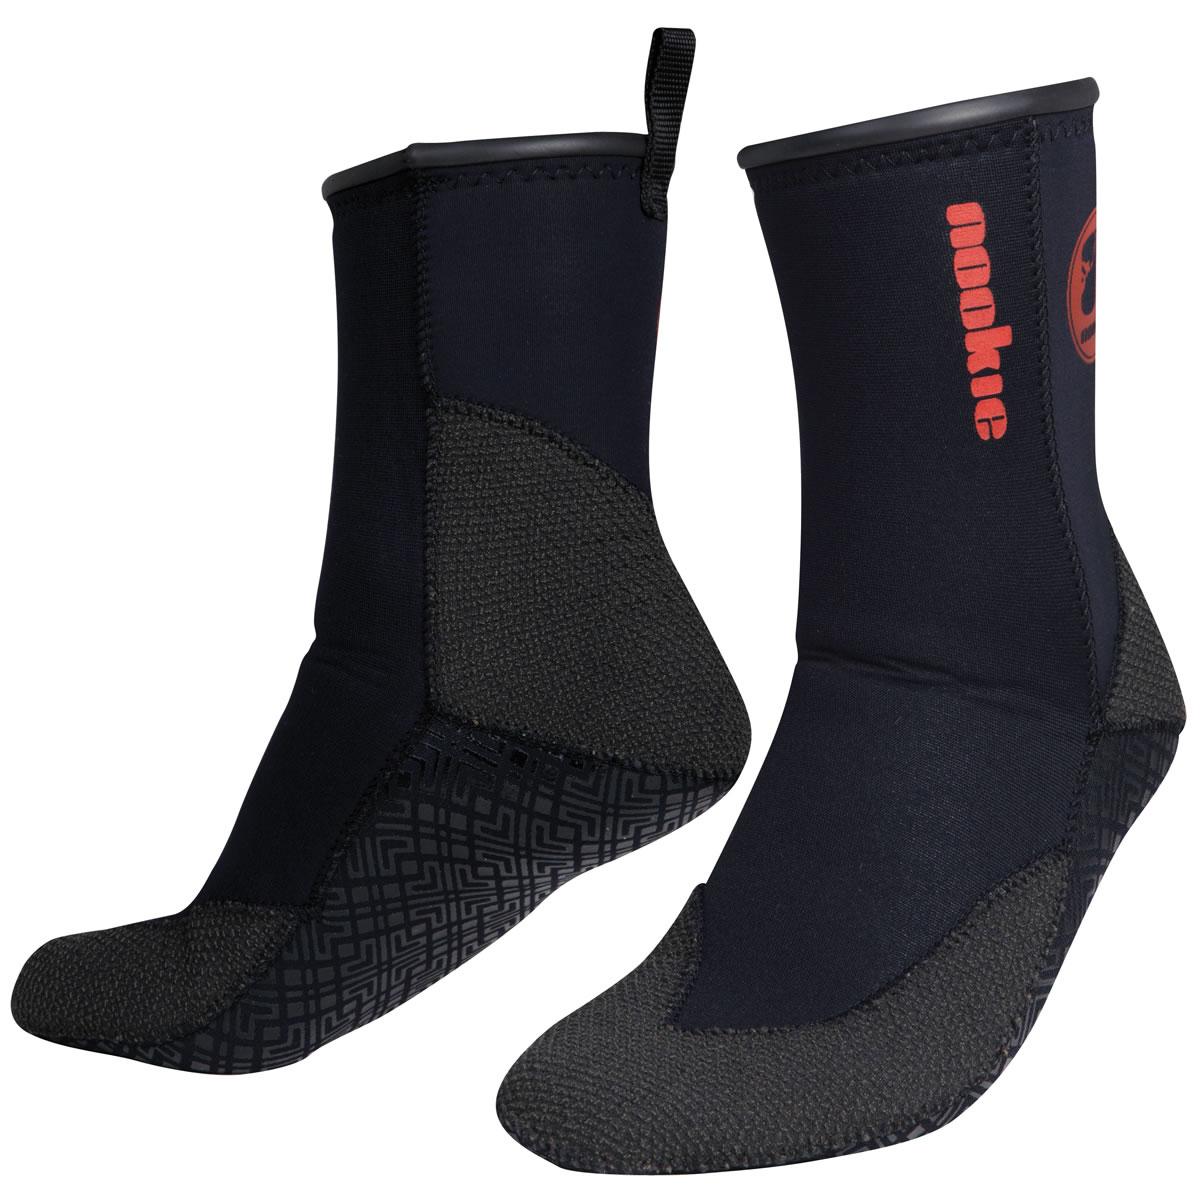 Nookie 3mm Neoprene Wetsuit Socks